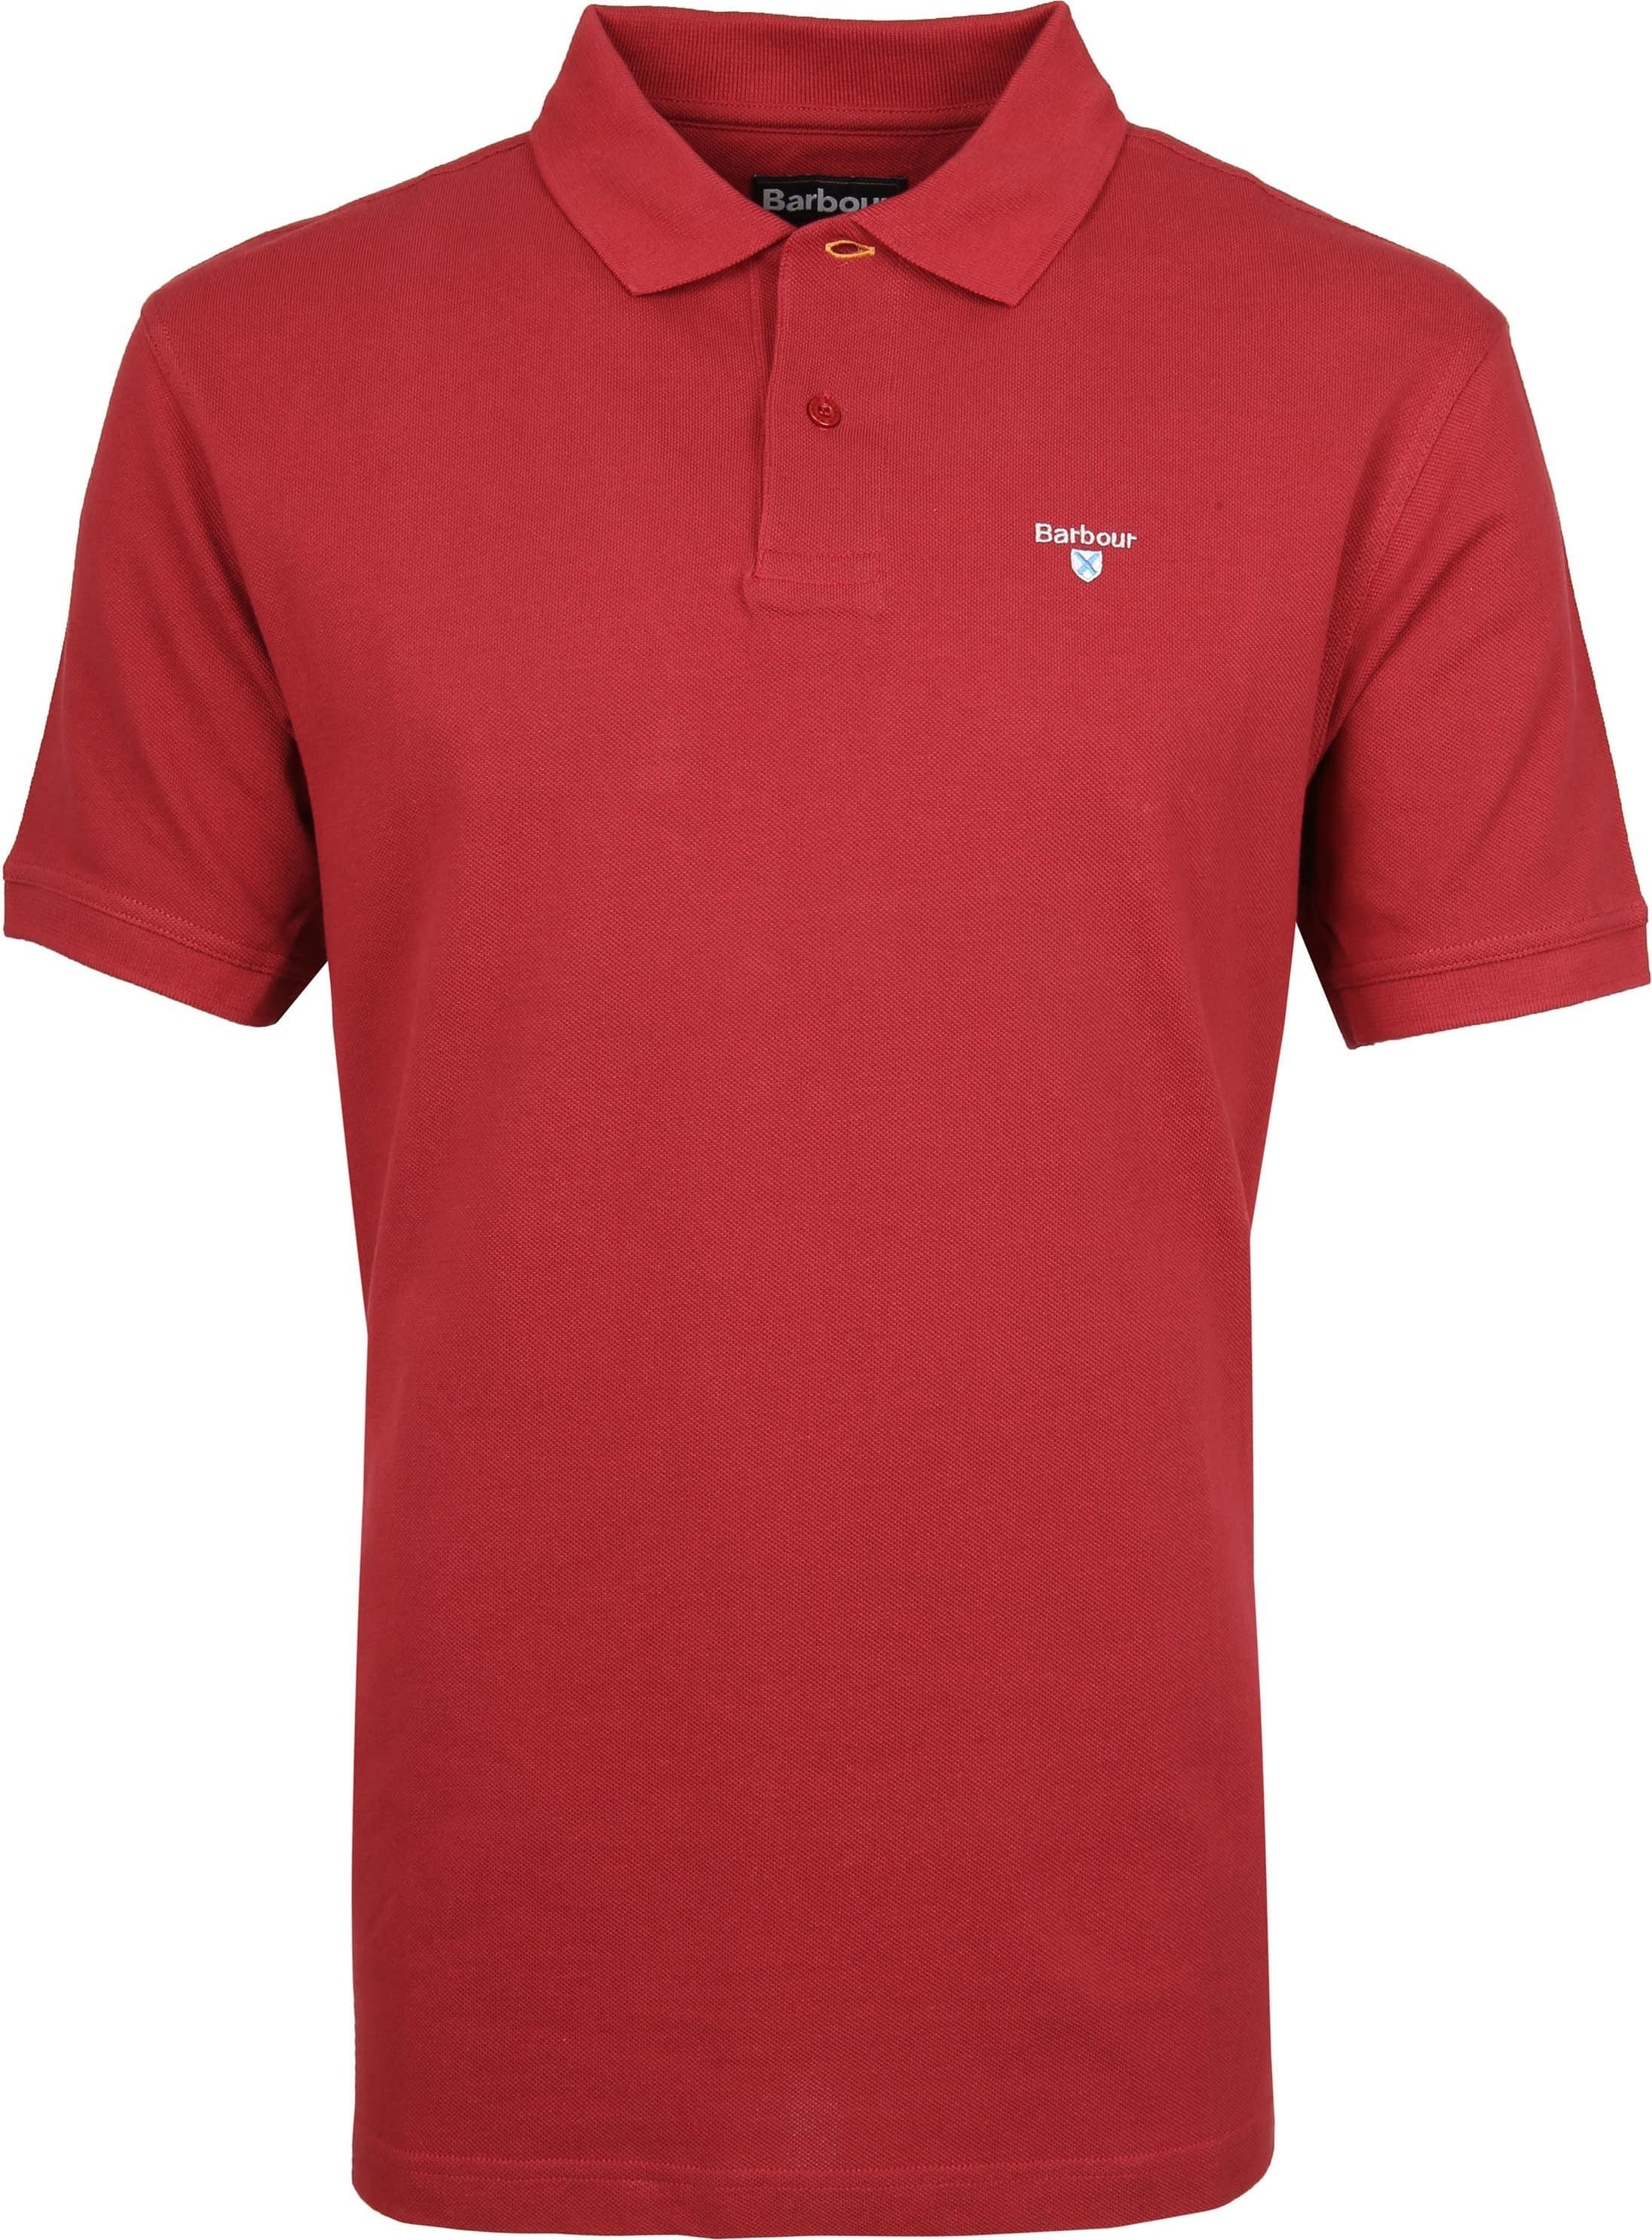 Barbour Basic Poloshirt Rot